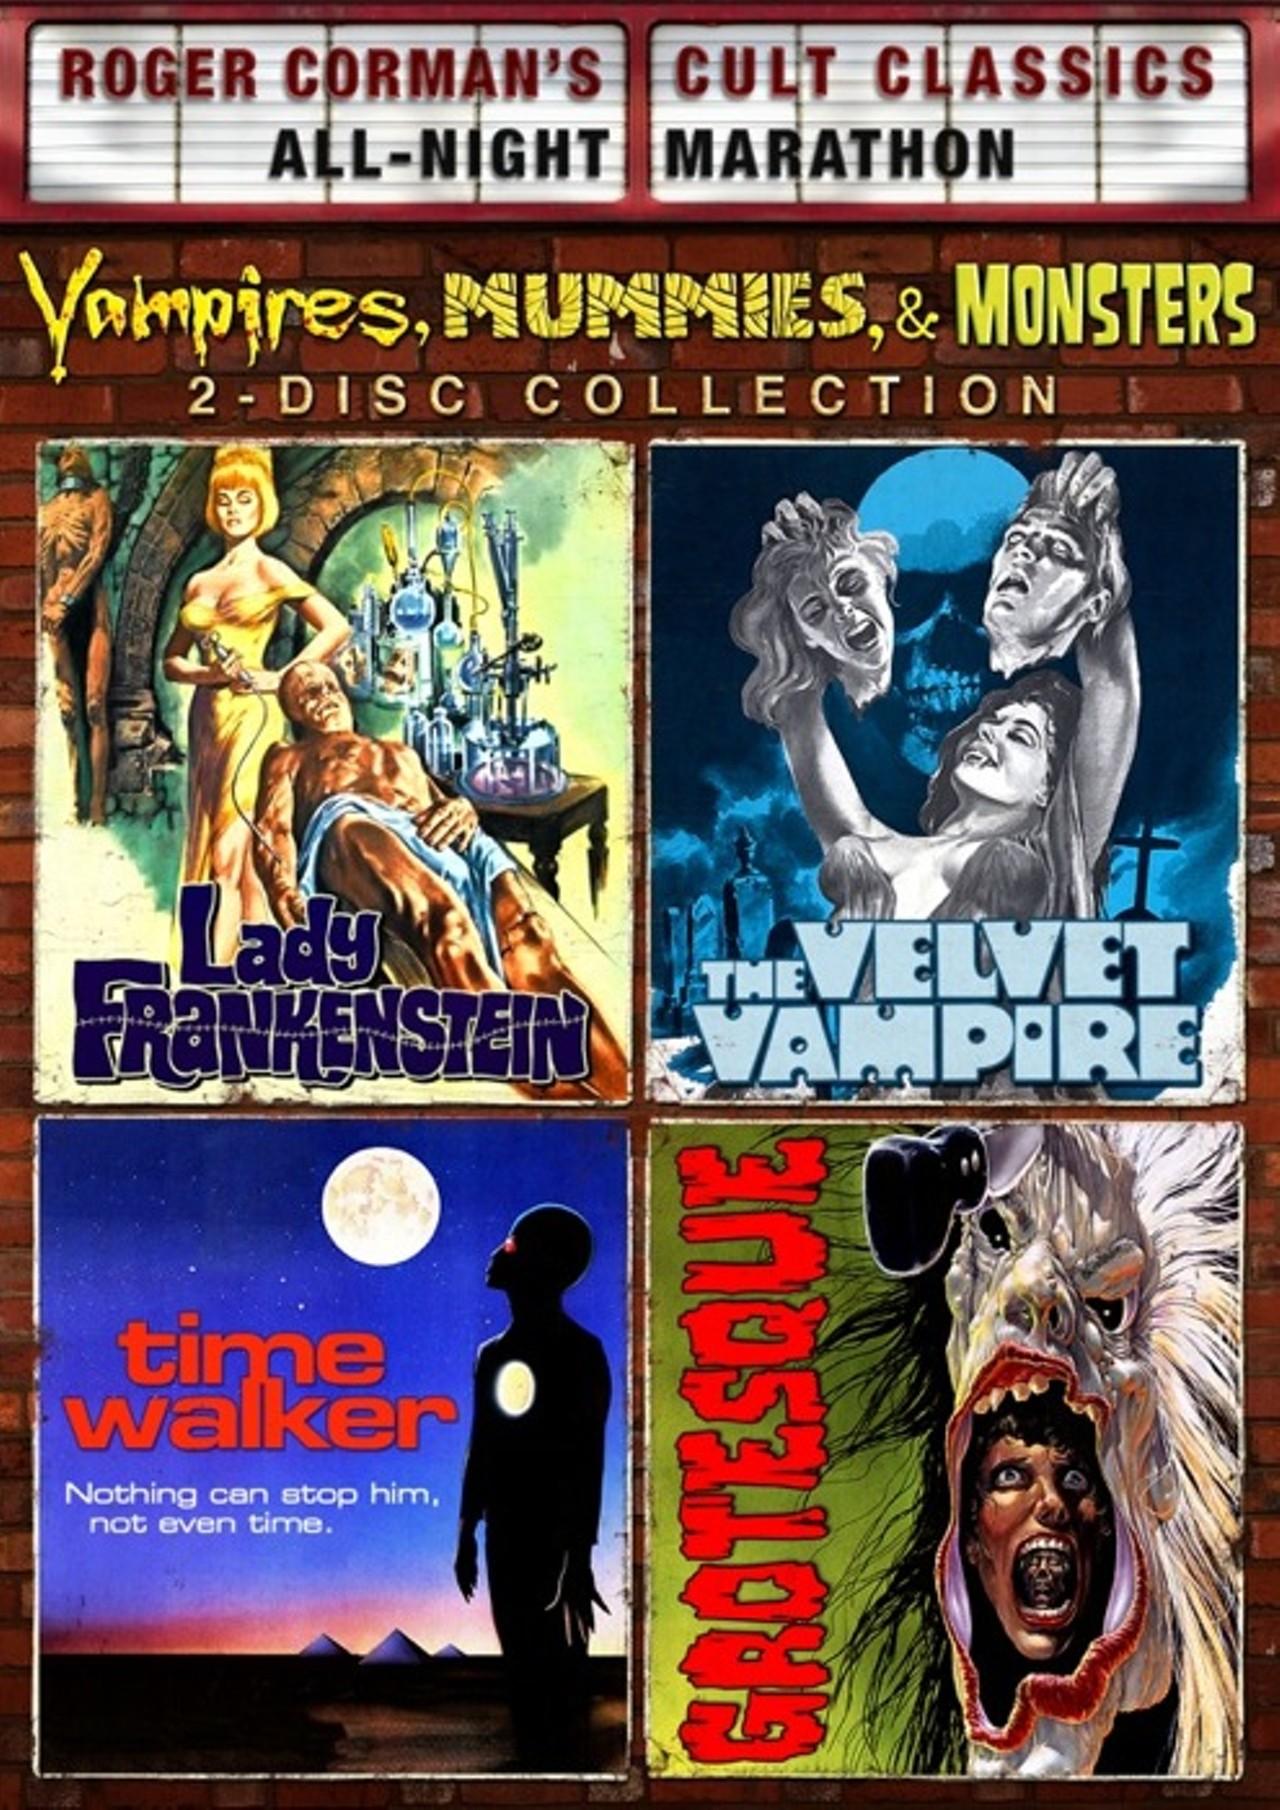 Vampires porn dvd nsfw video